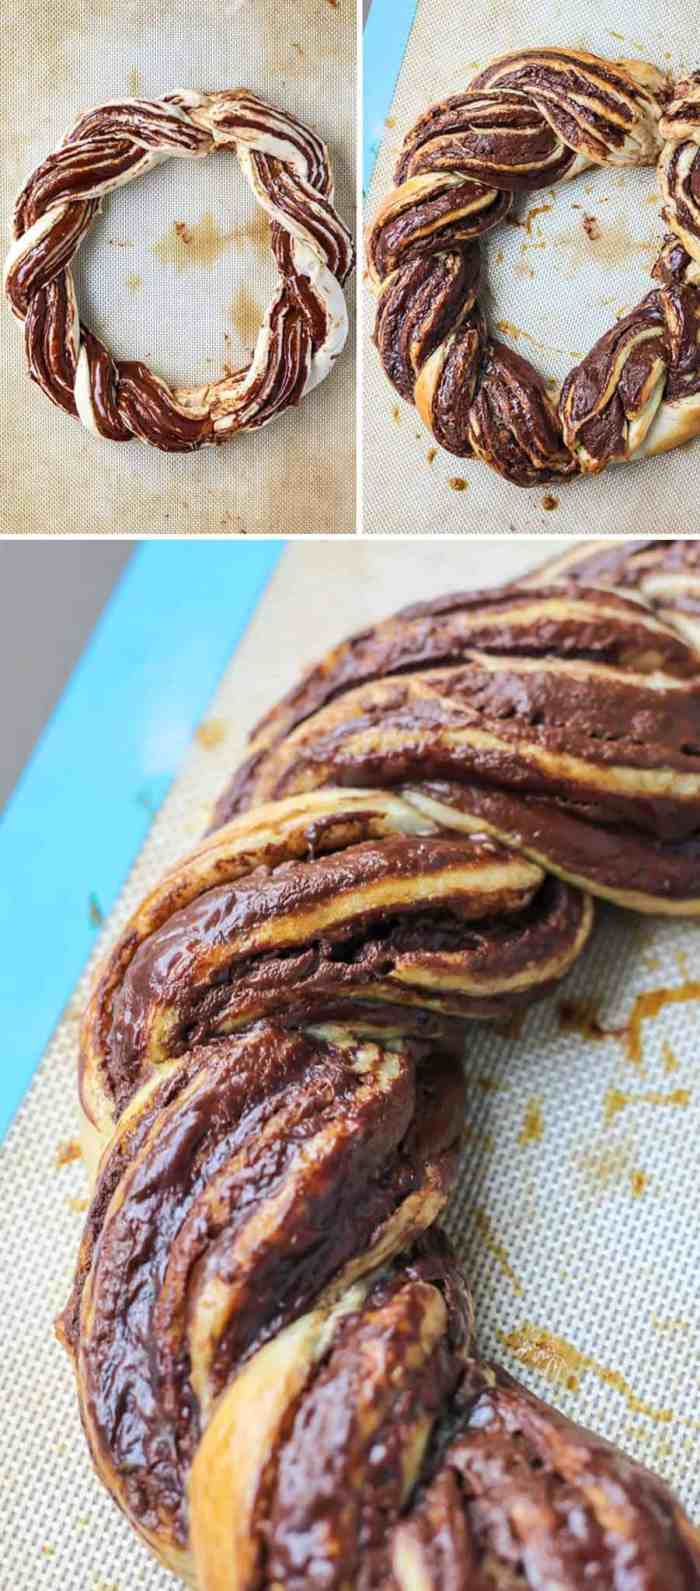 2-Ingredient Chocolate Braided Bread!